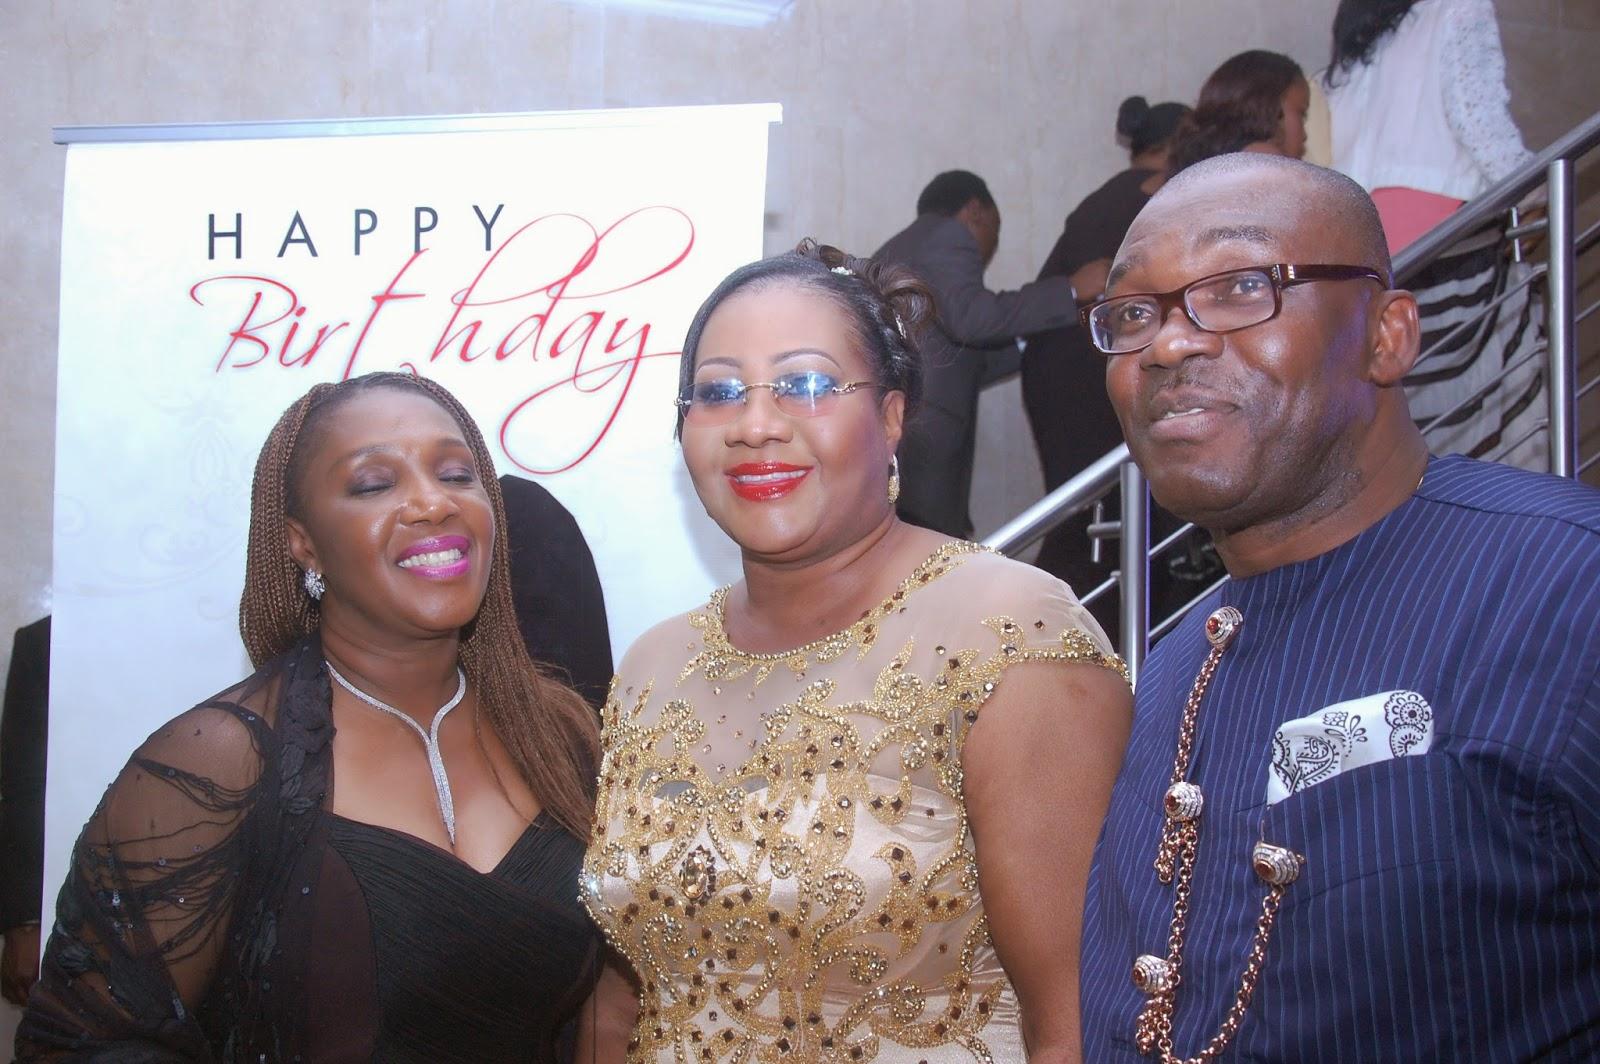 PHOTOS: Star-studded birthday party for Toolz! - Nigerian